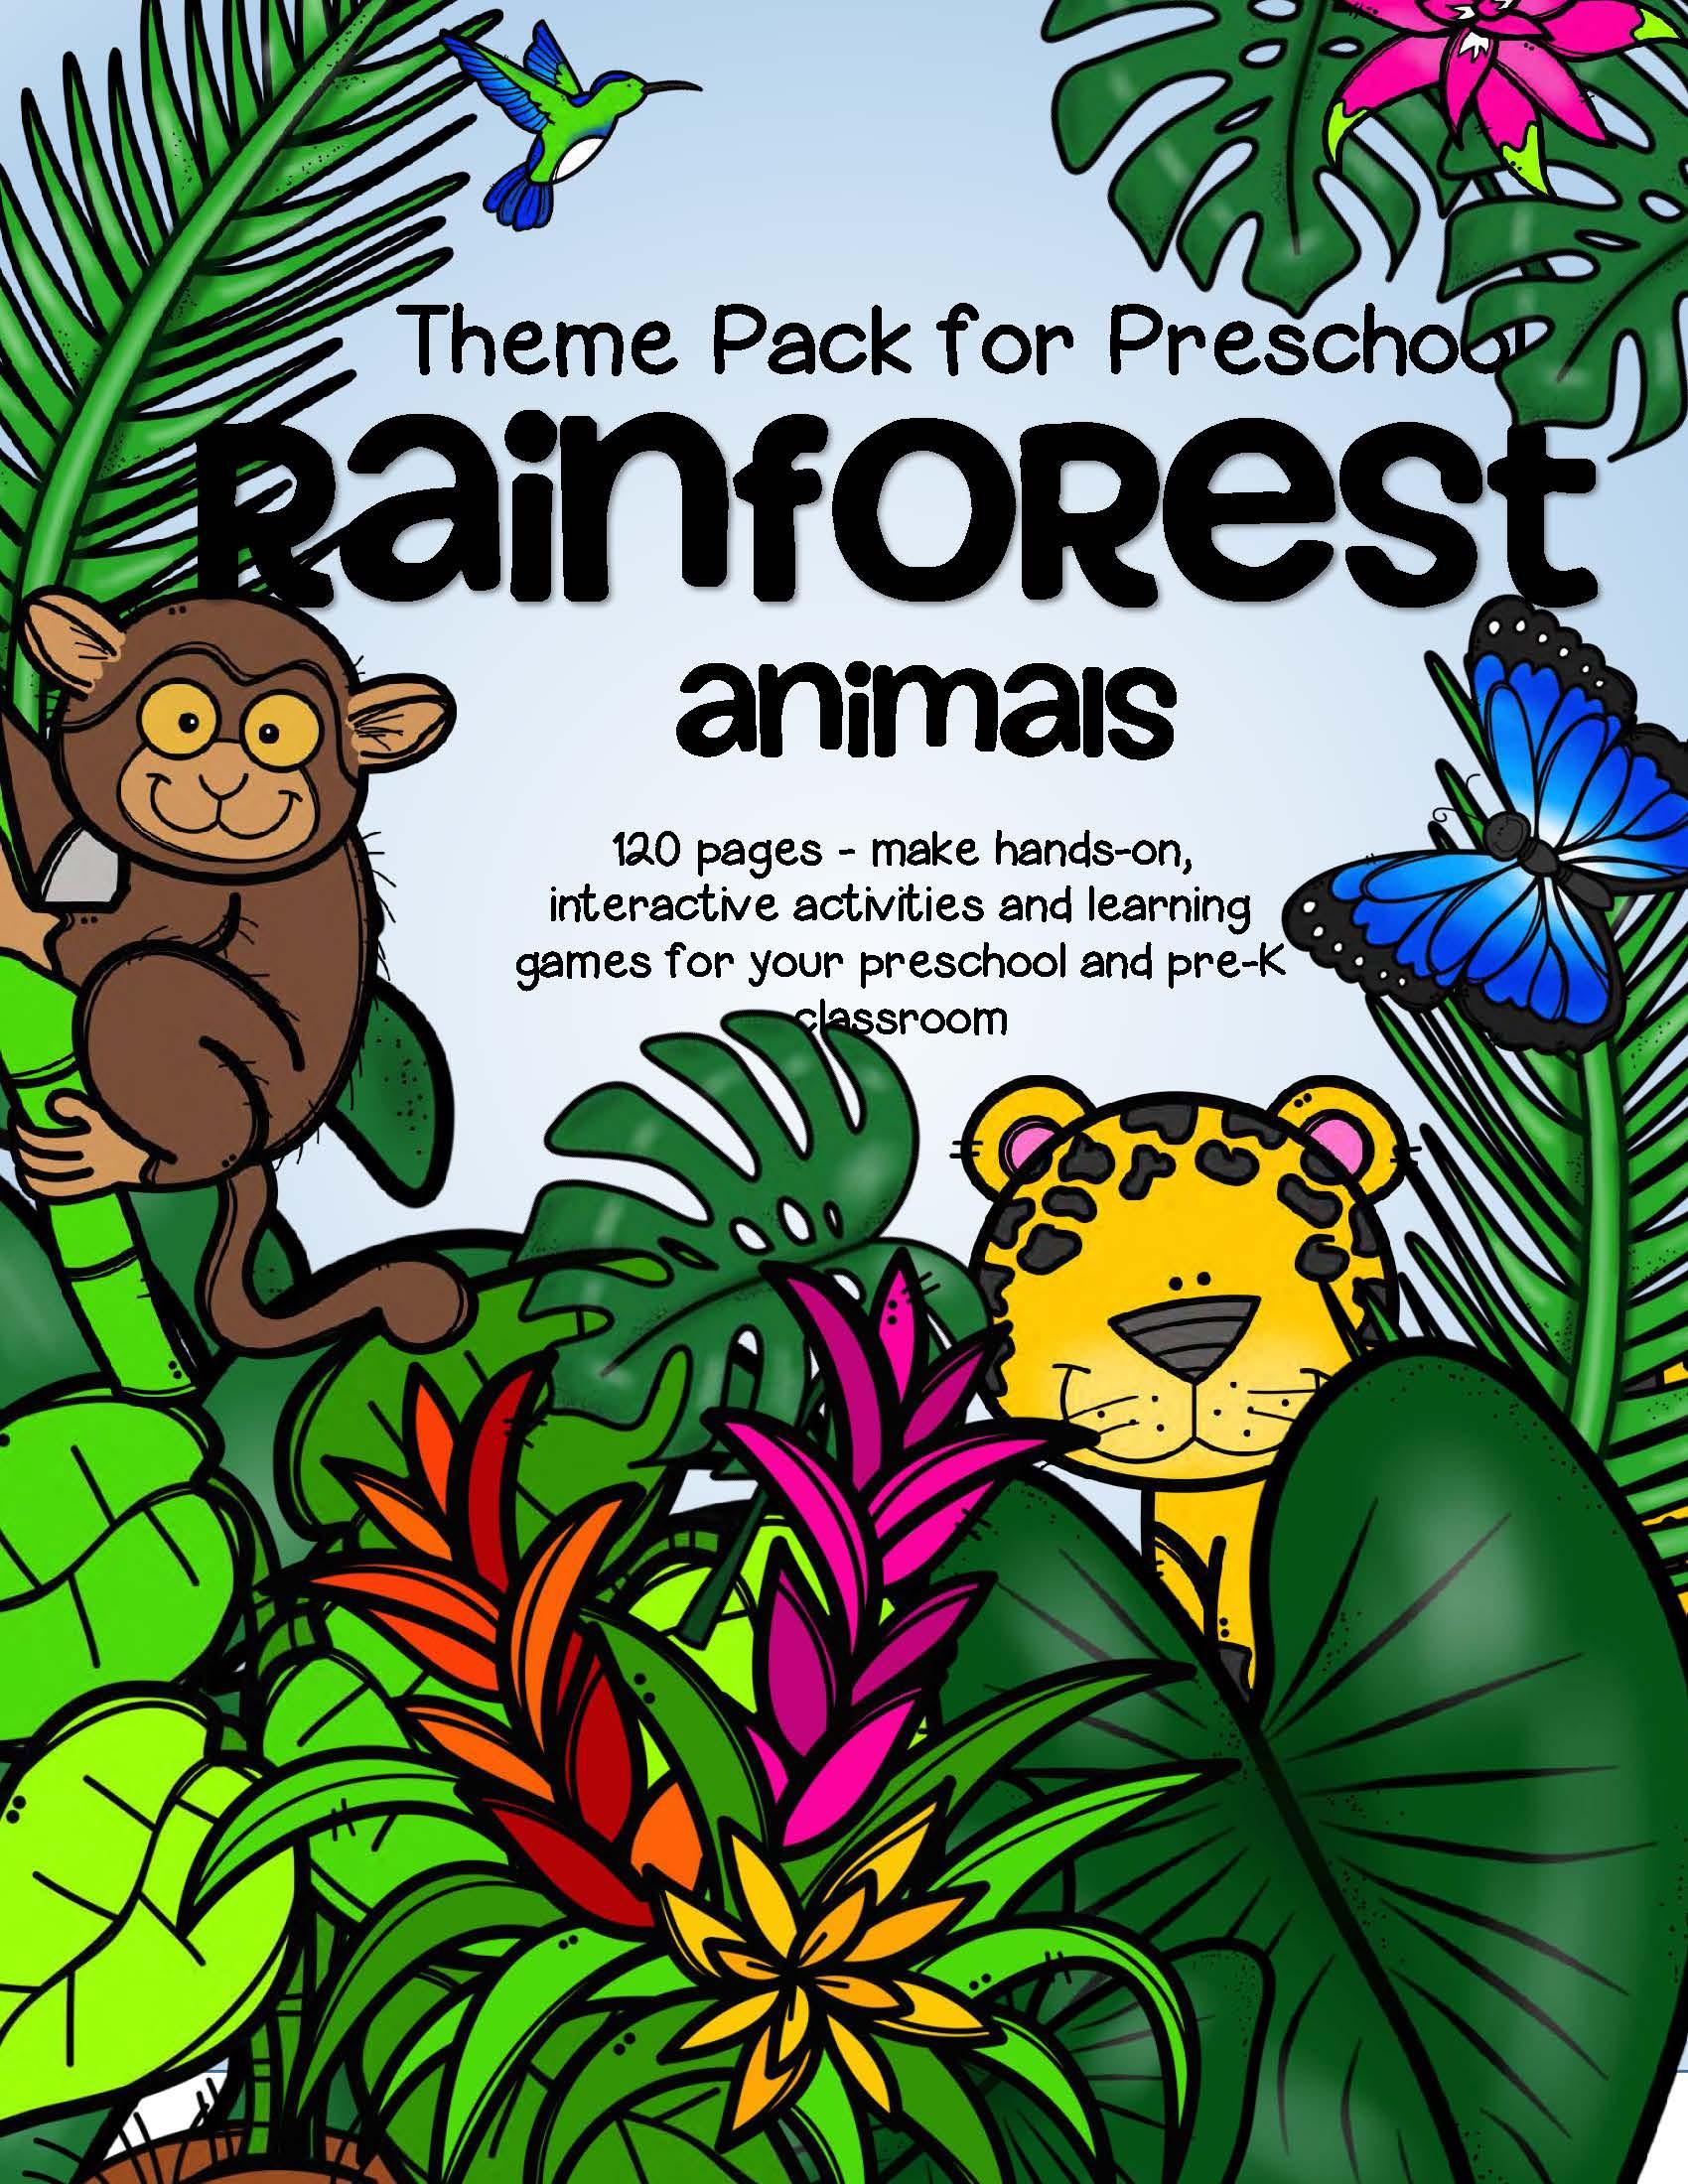 RAINFOREST ANIMALS Theme Pack for Preschool